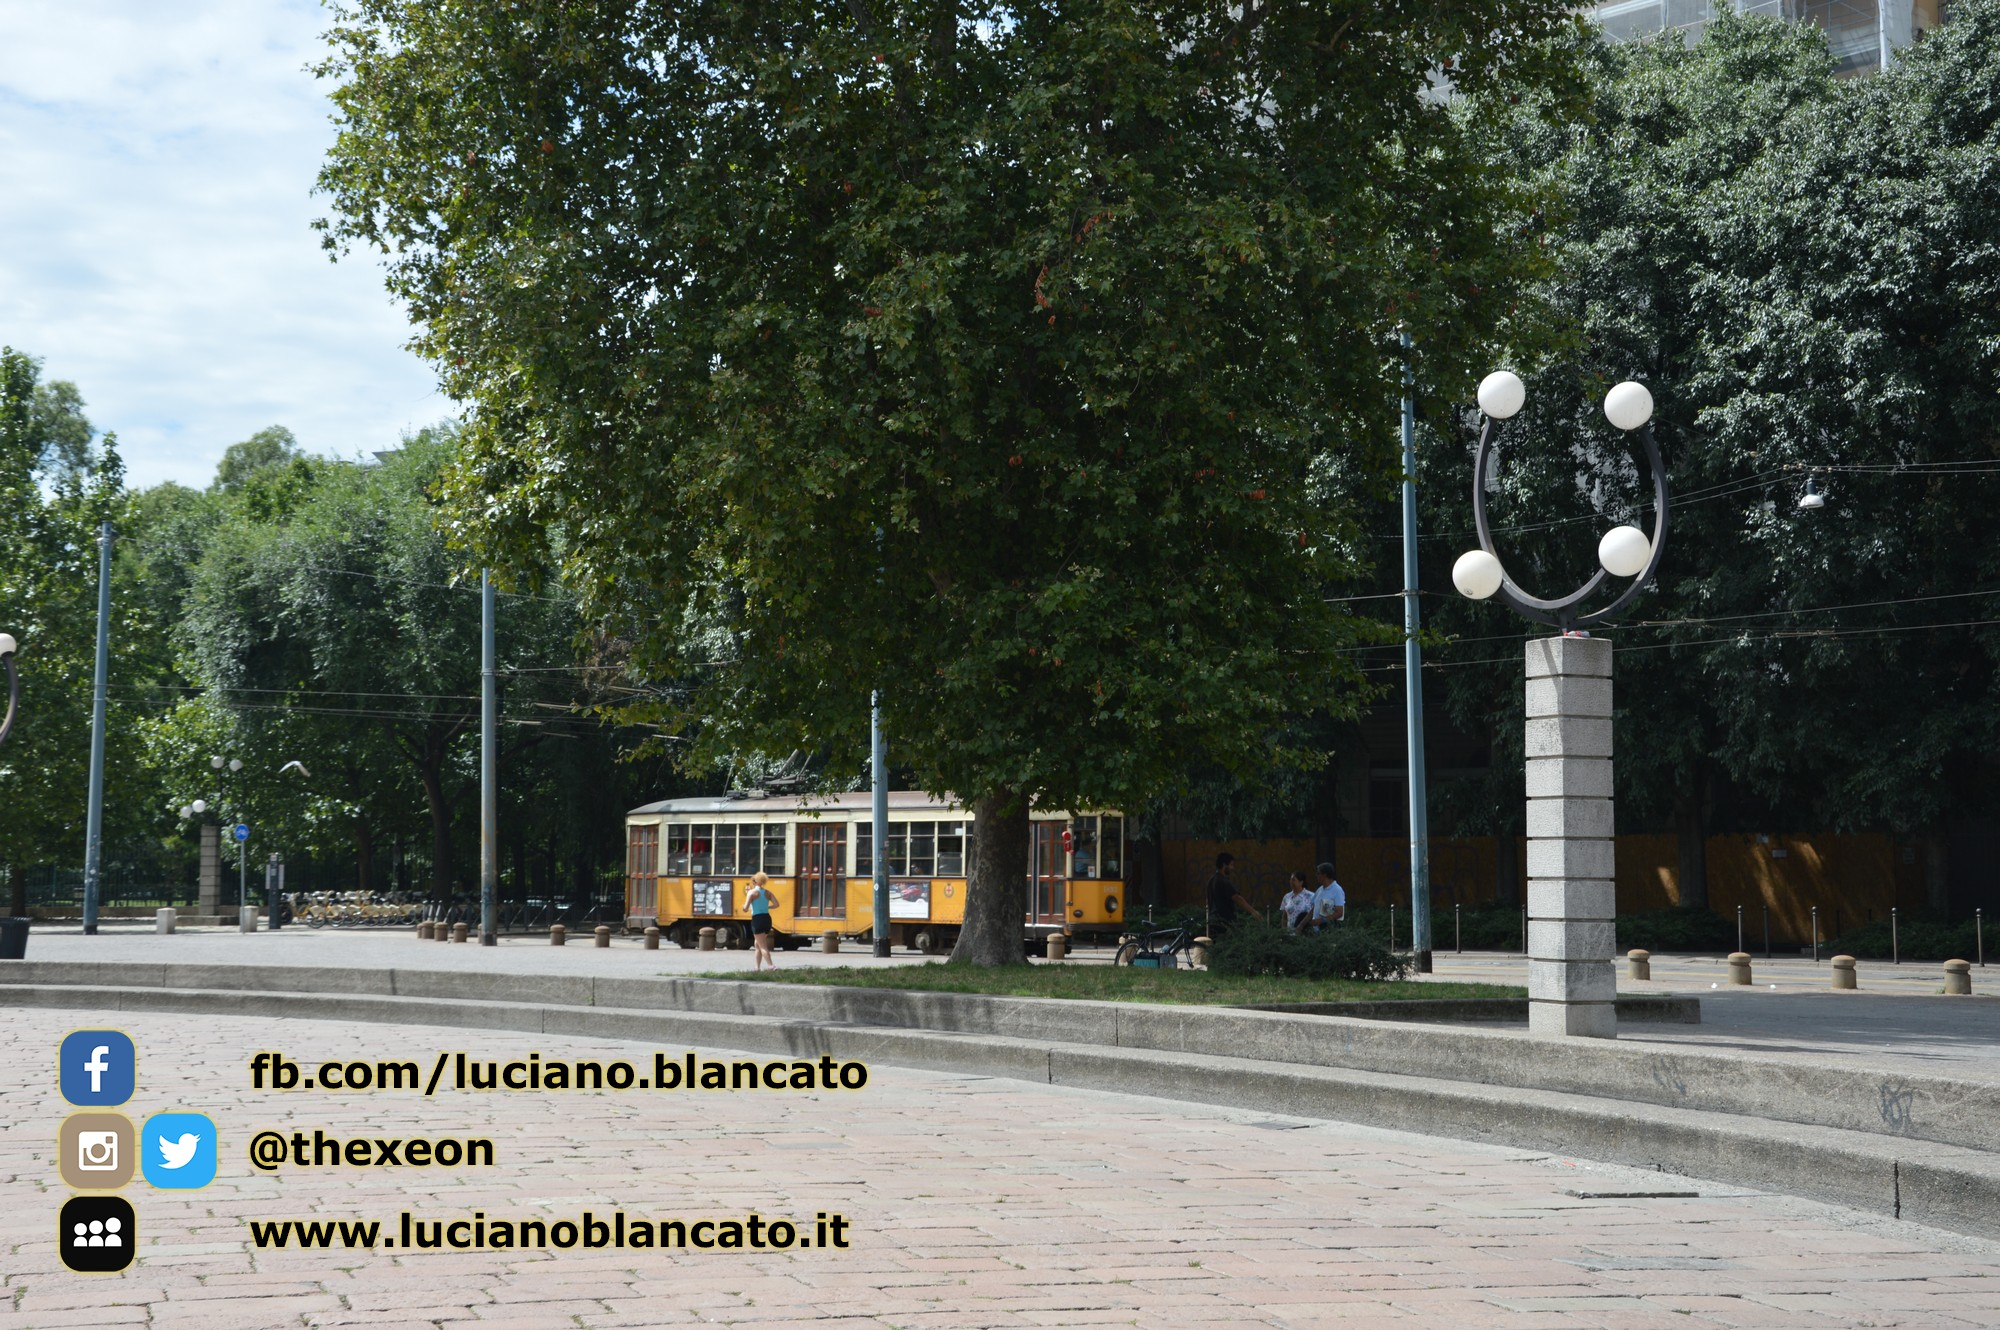 Milano - in giro per la città - tram